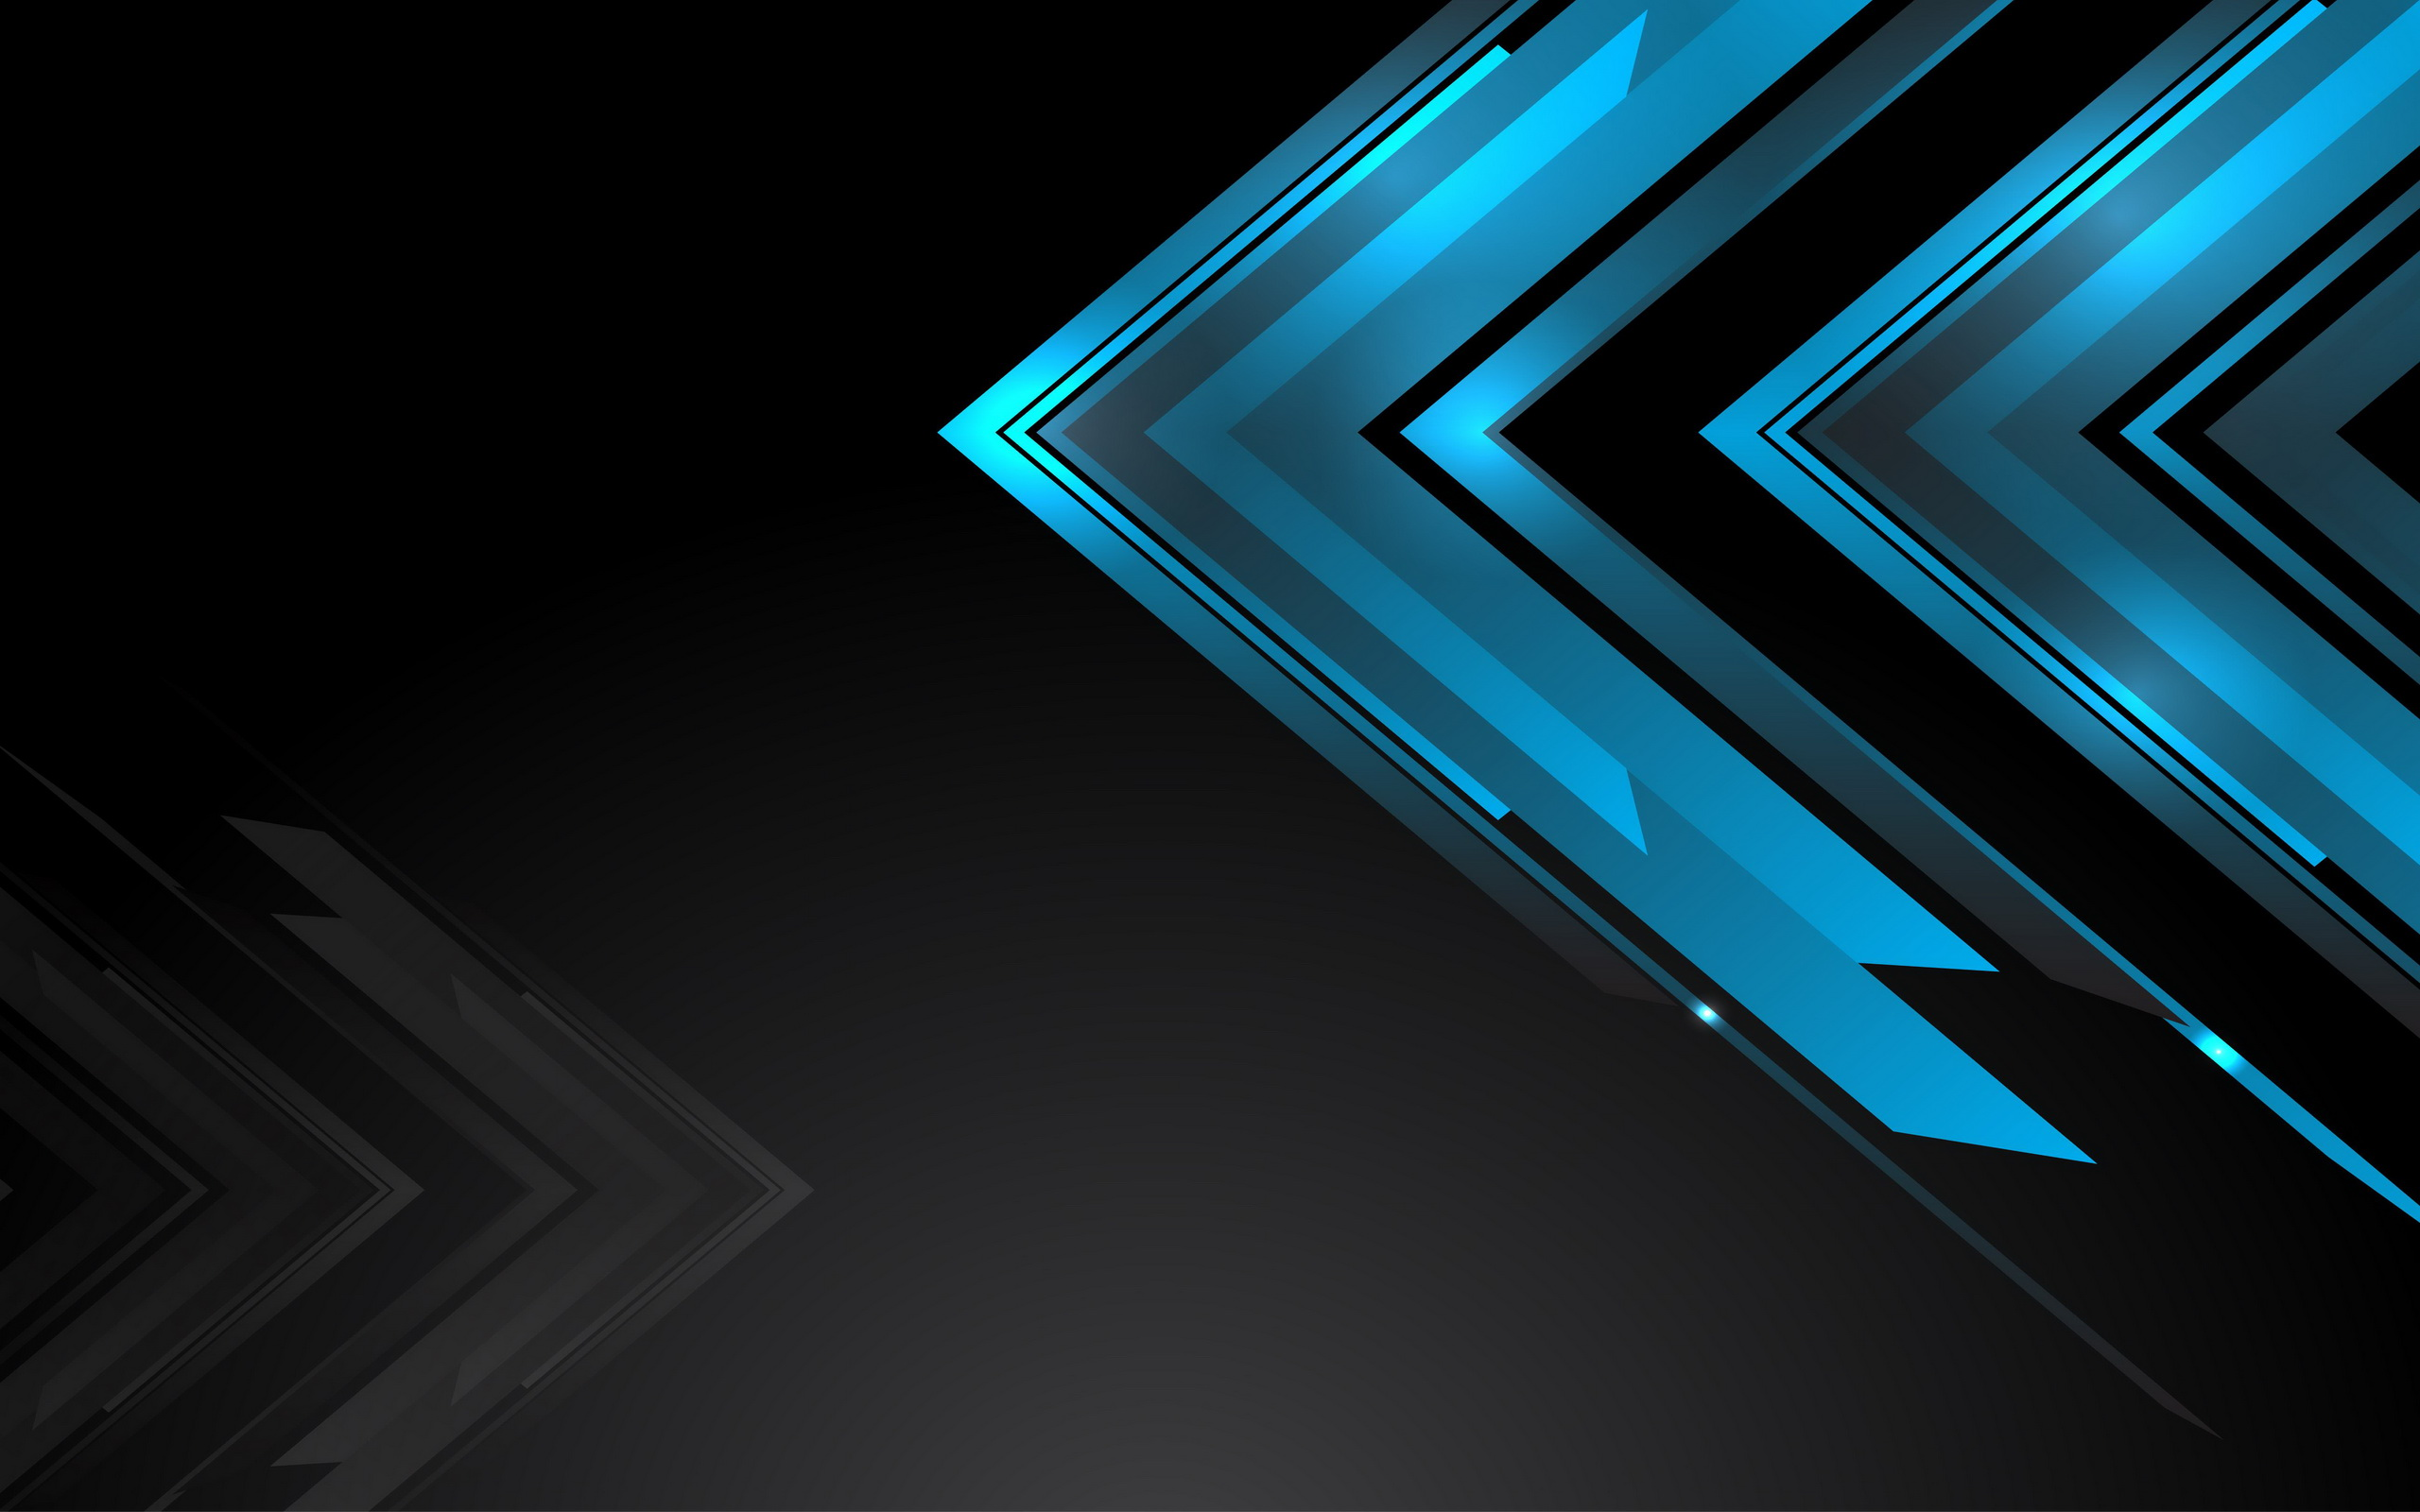 Black Turquoise Computer Wallpapers Desktop Backgrounds 2560x1600 2560x1600